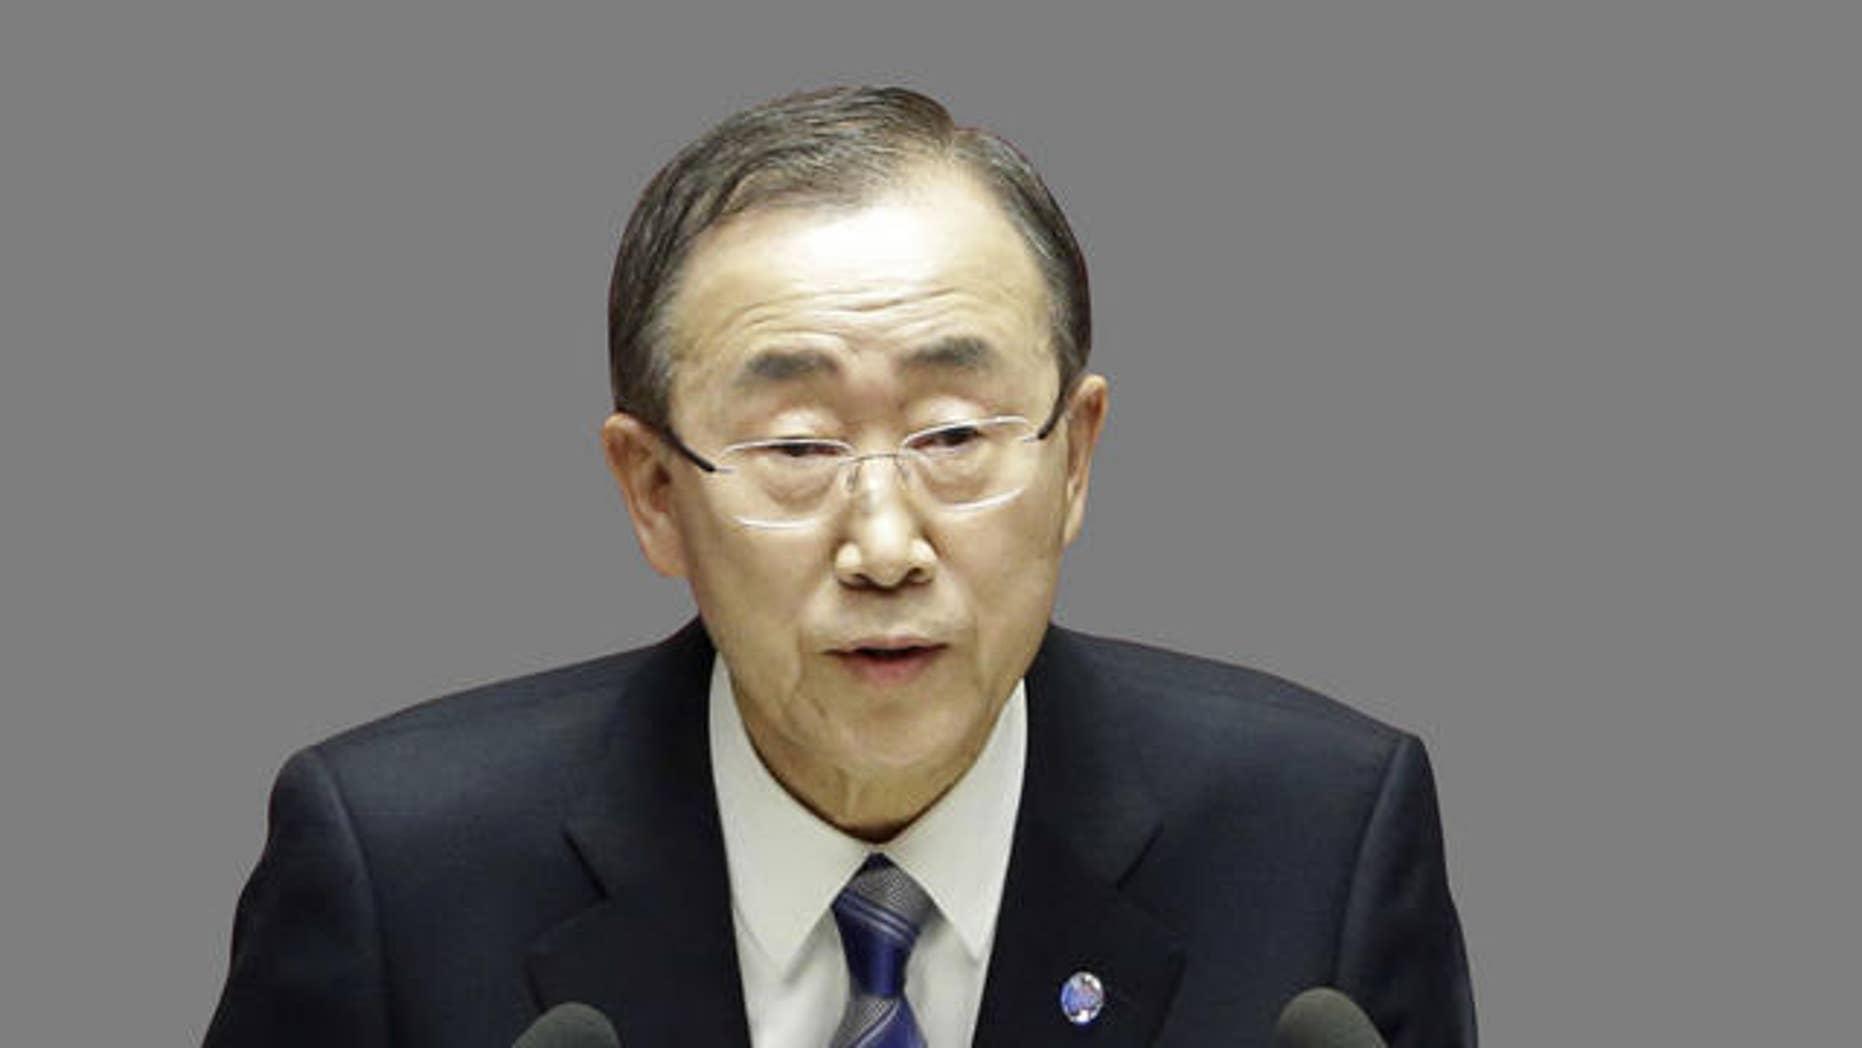 November 21, 2012 - FILE photo of U.N. Secretary-General Ban Ki-moon